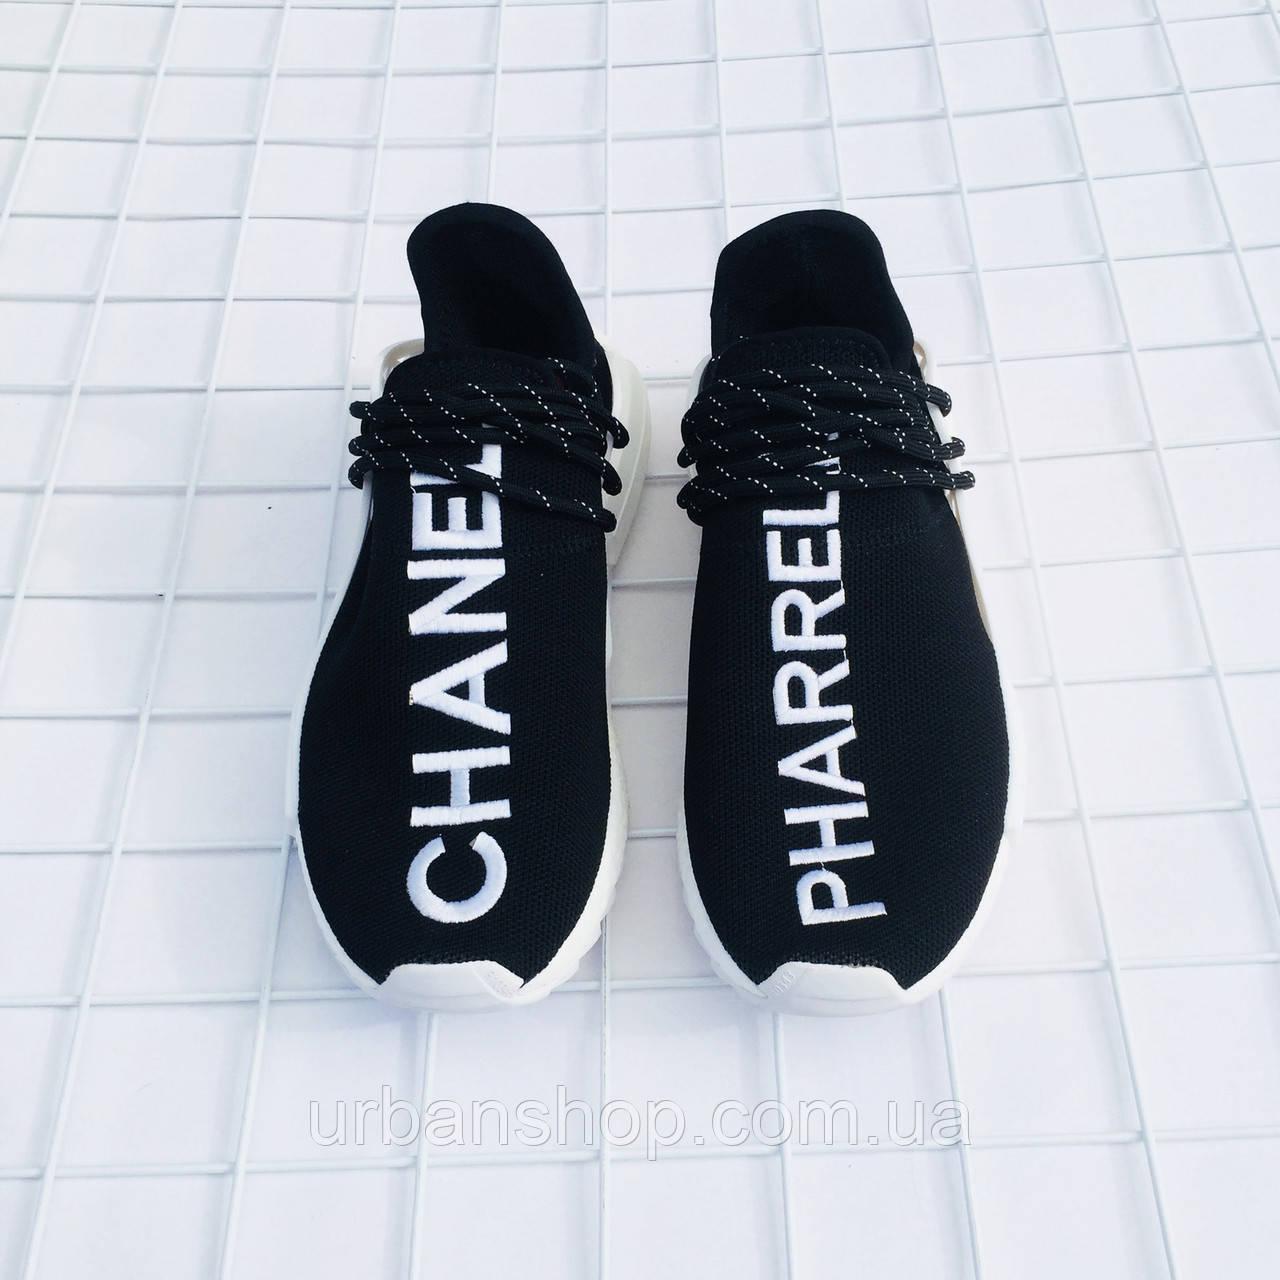 quality design e6307 01c08 Взуття Adidas Chanel x adidas Originals Pharrell Williams Hu NMD 36